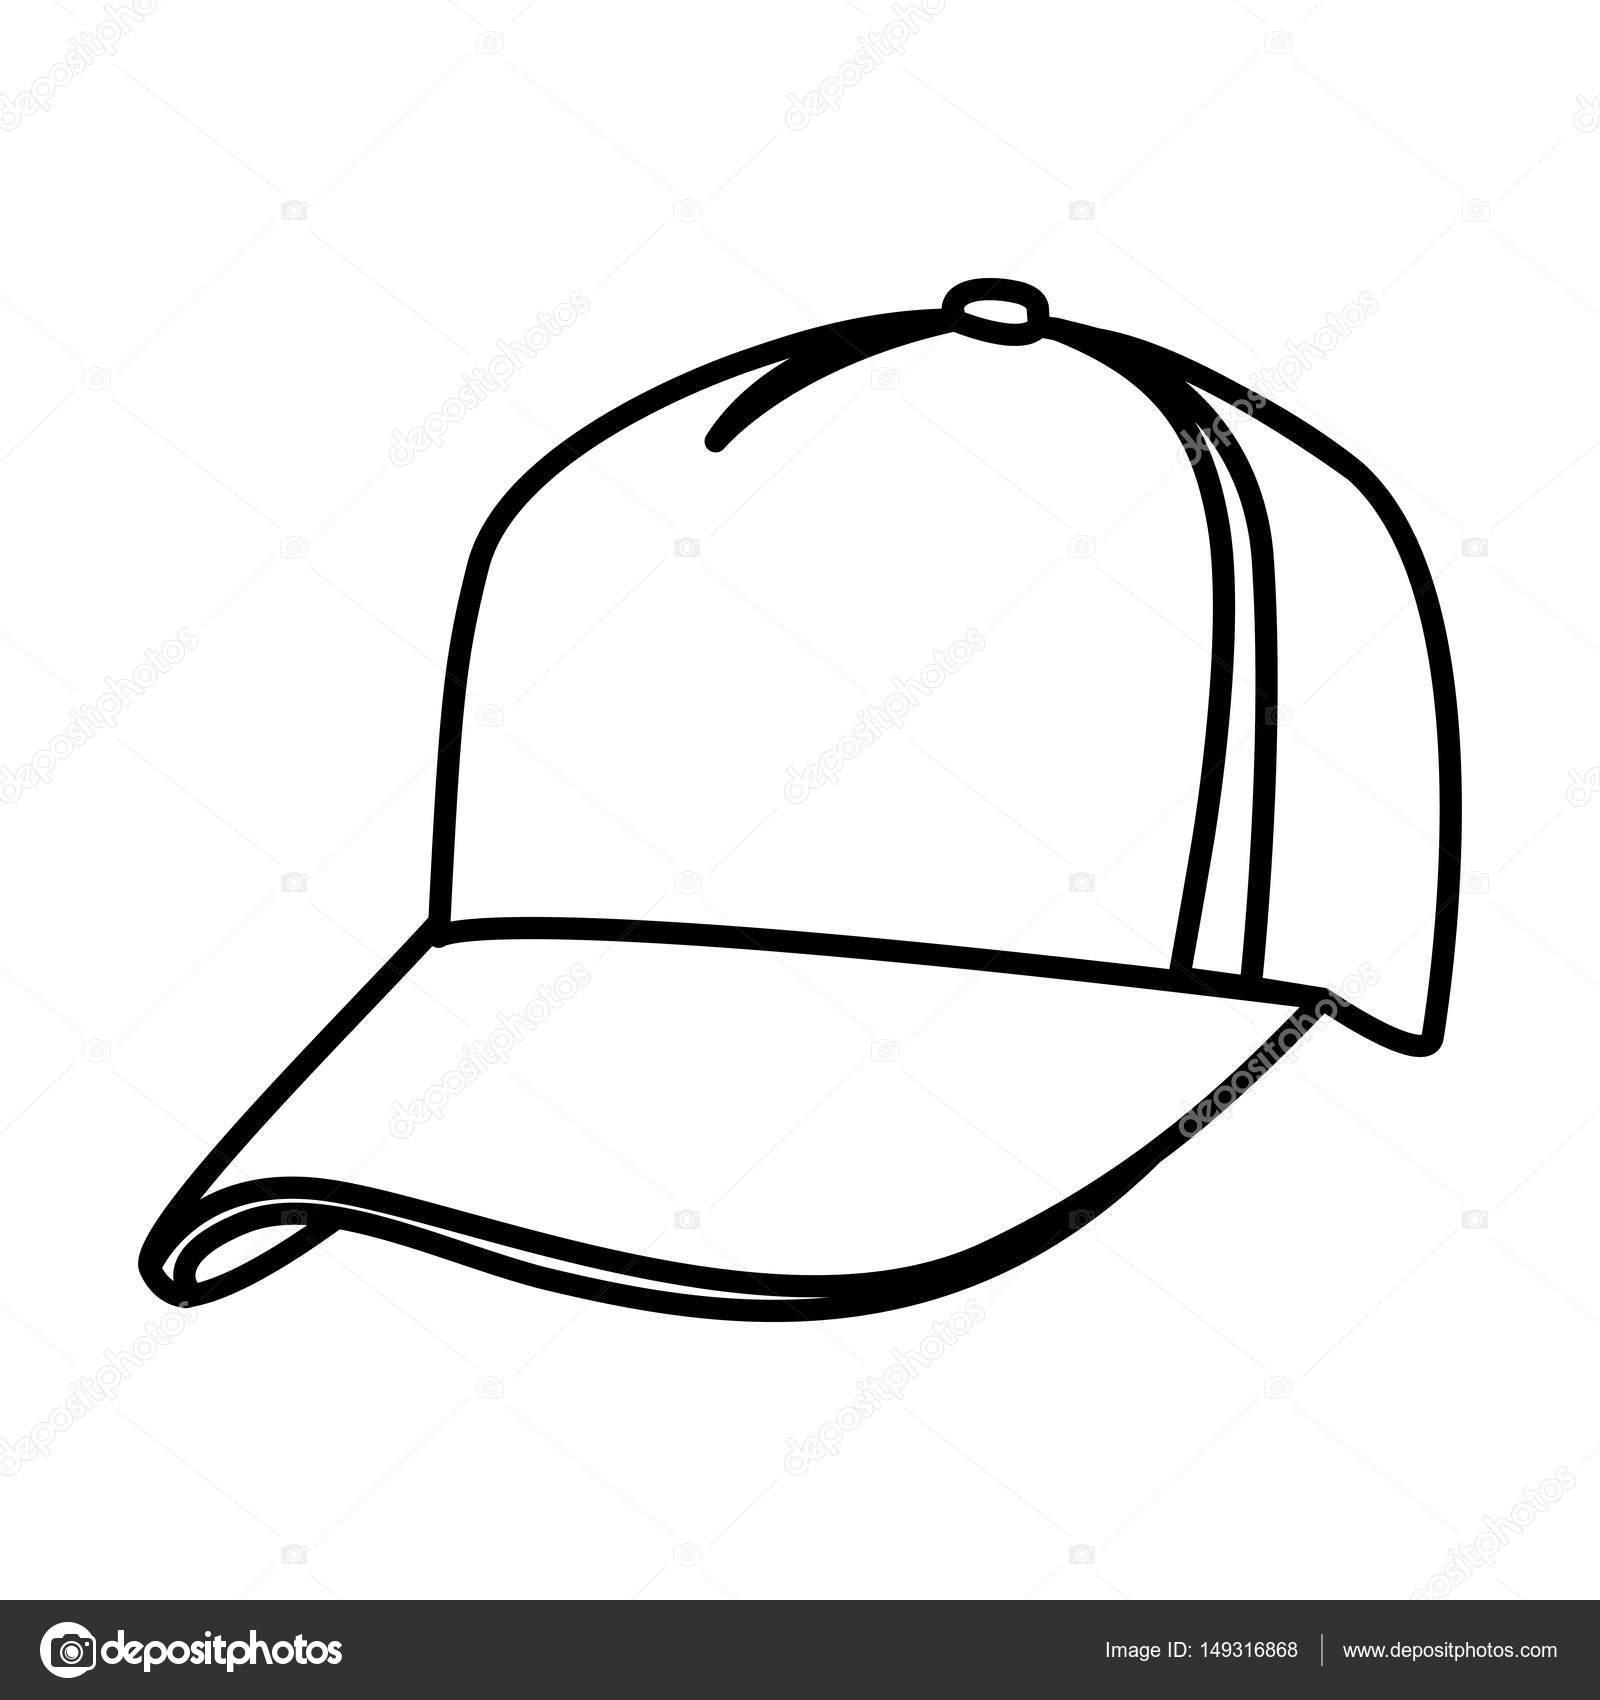 monochrome contour of baseball cap stock vector grgroupstock rh depositphotos com baseball cap vector template baseball cap vector free download